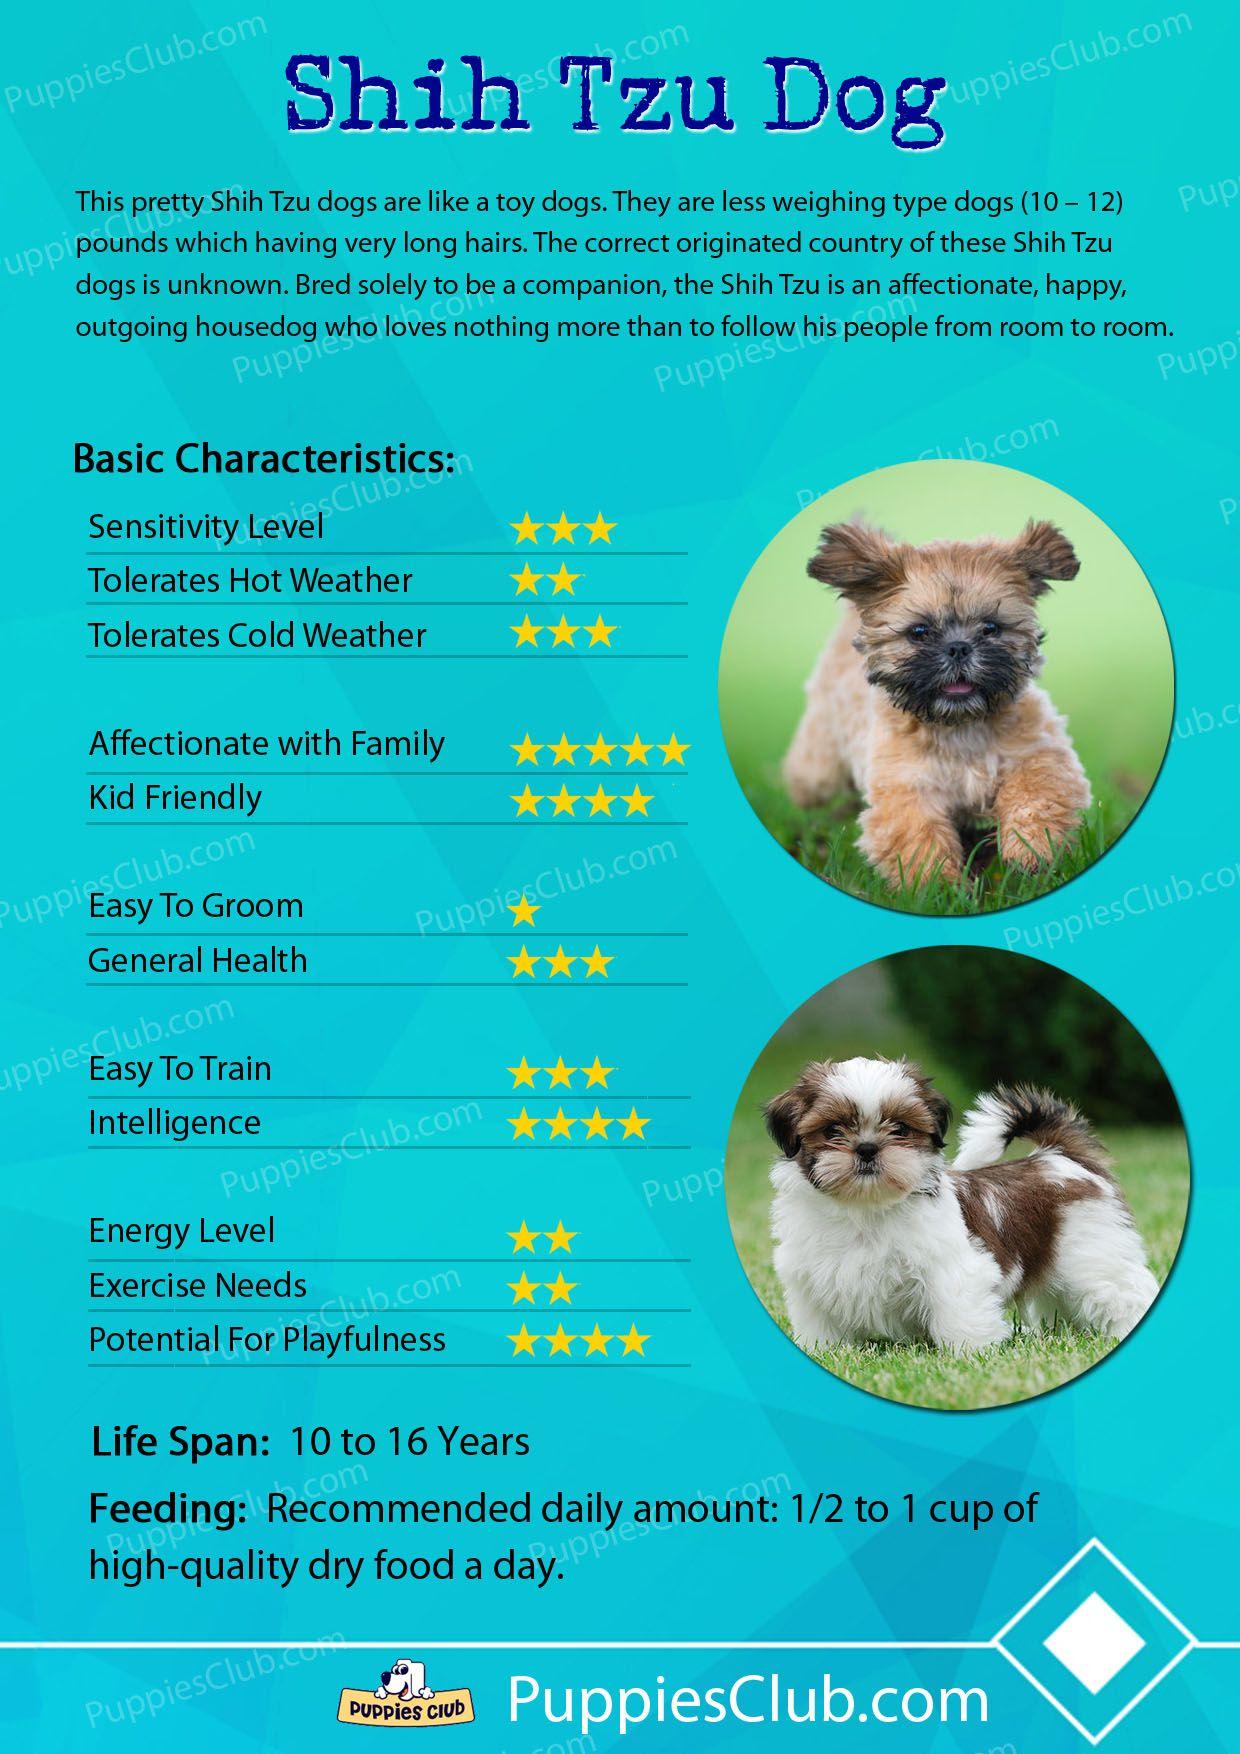 Shih Tzu Shih Tzu Dog Dog Facts Shih Tzu Puppy Training